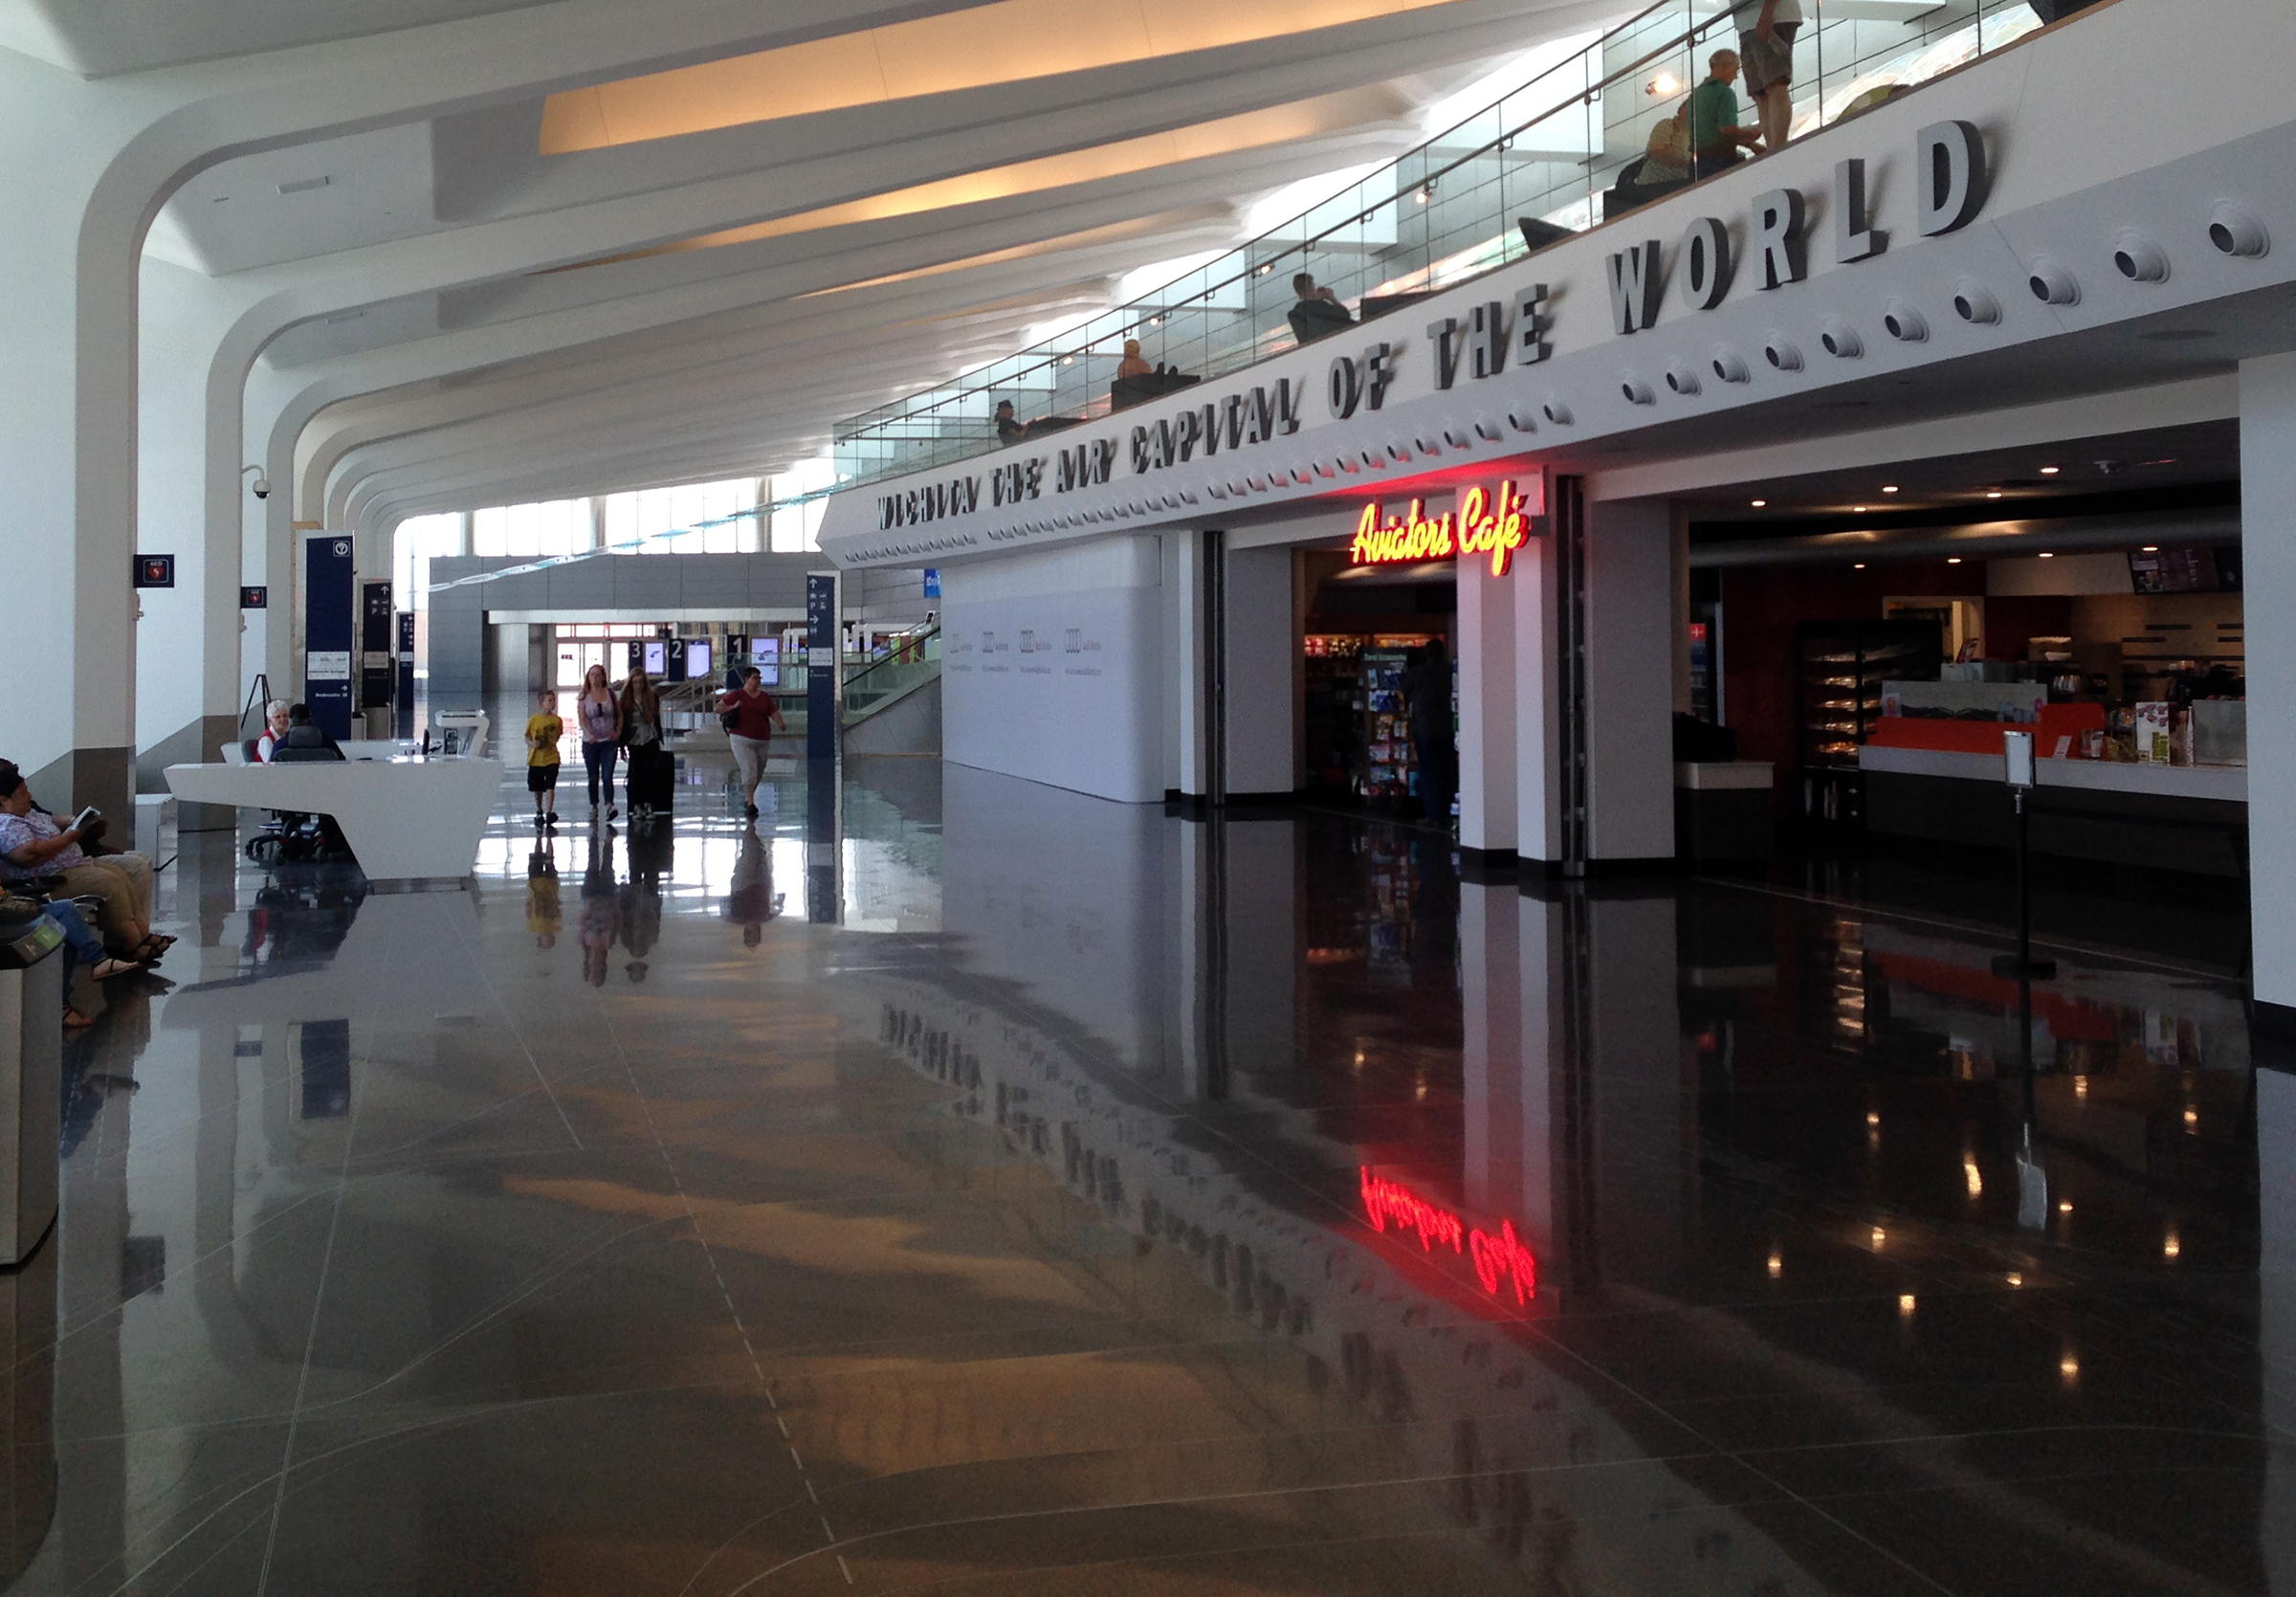 Wichita Dwight D  Eisenhower National Airport - Wikipedia